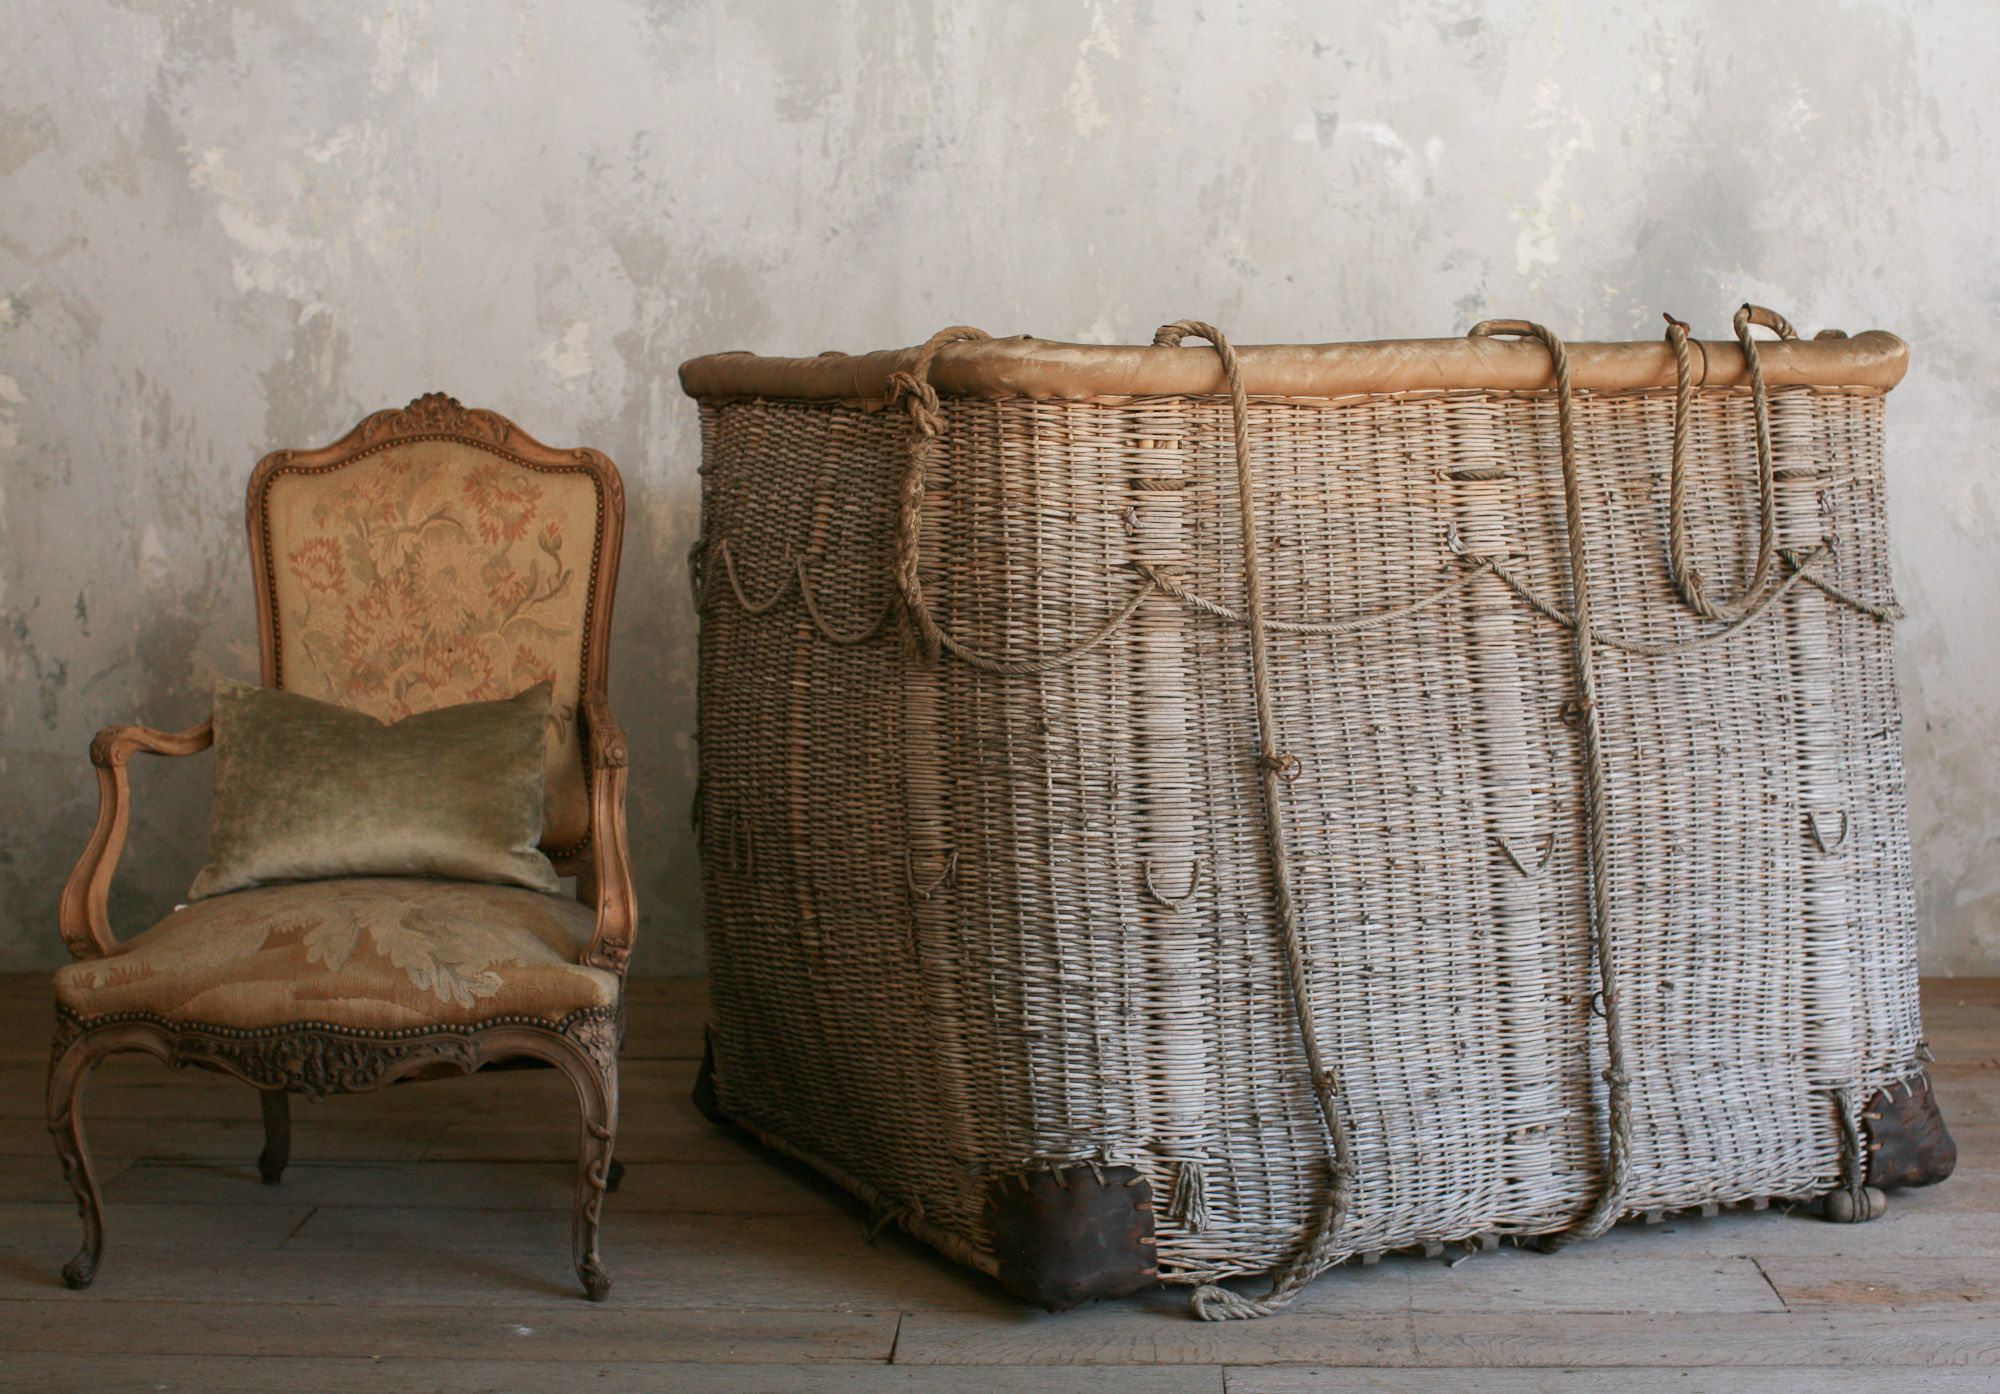 Antique basket from a hot air balloon. Interiør, Vintage